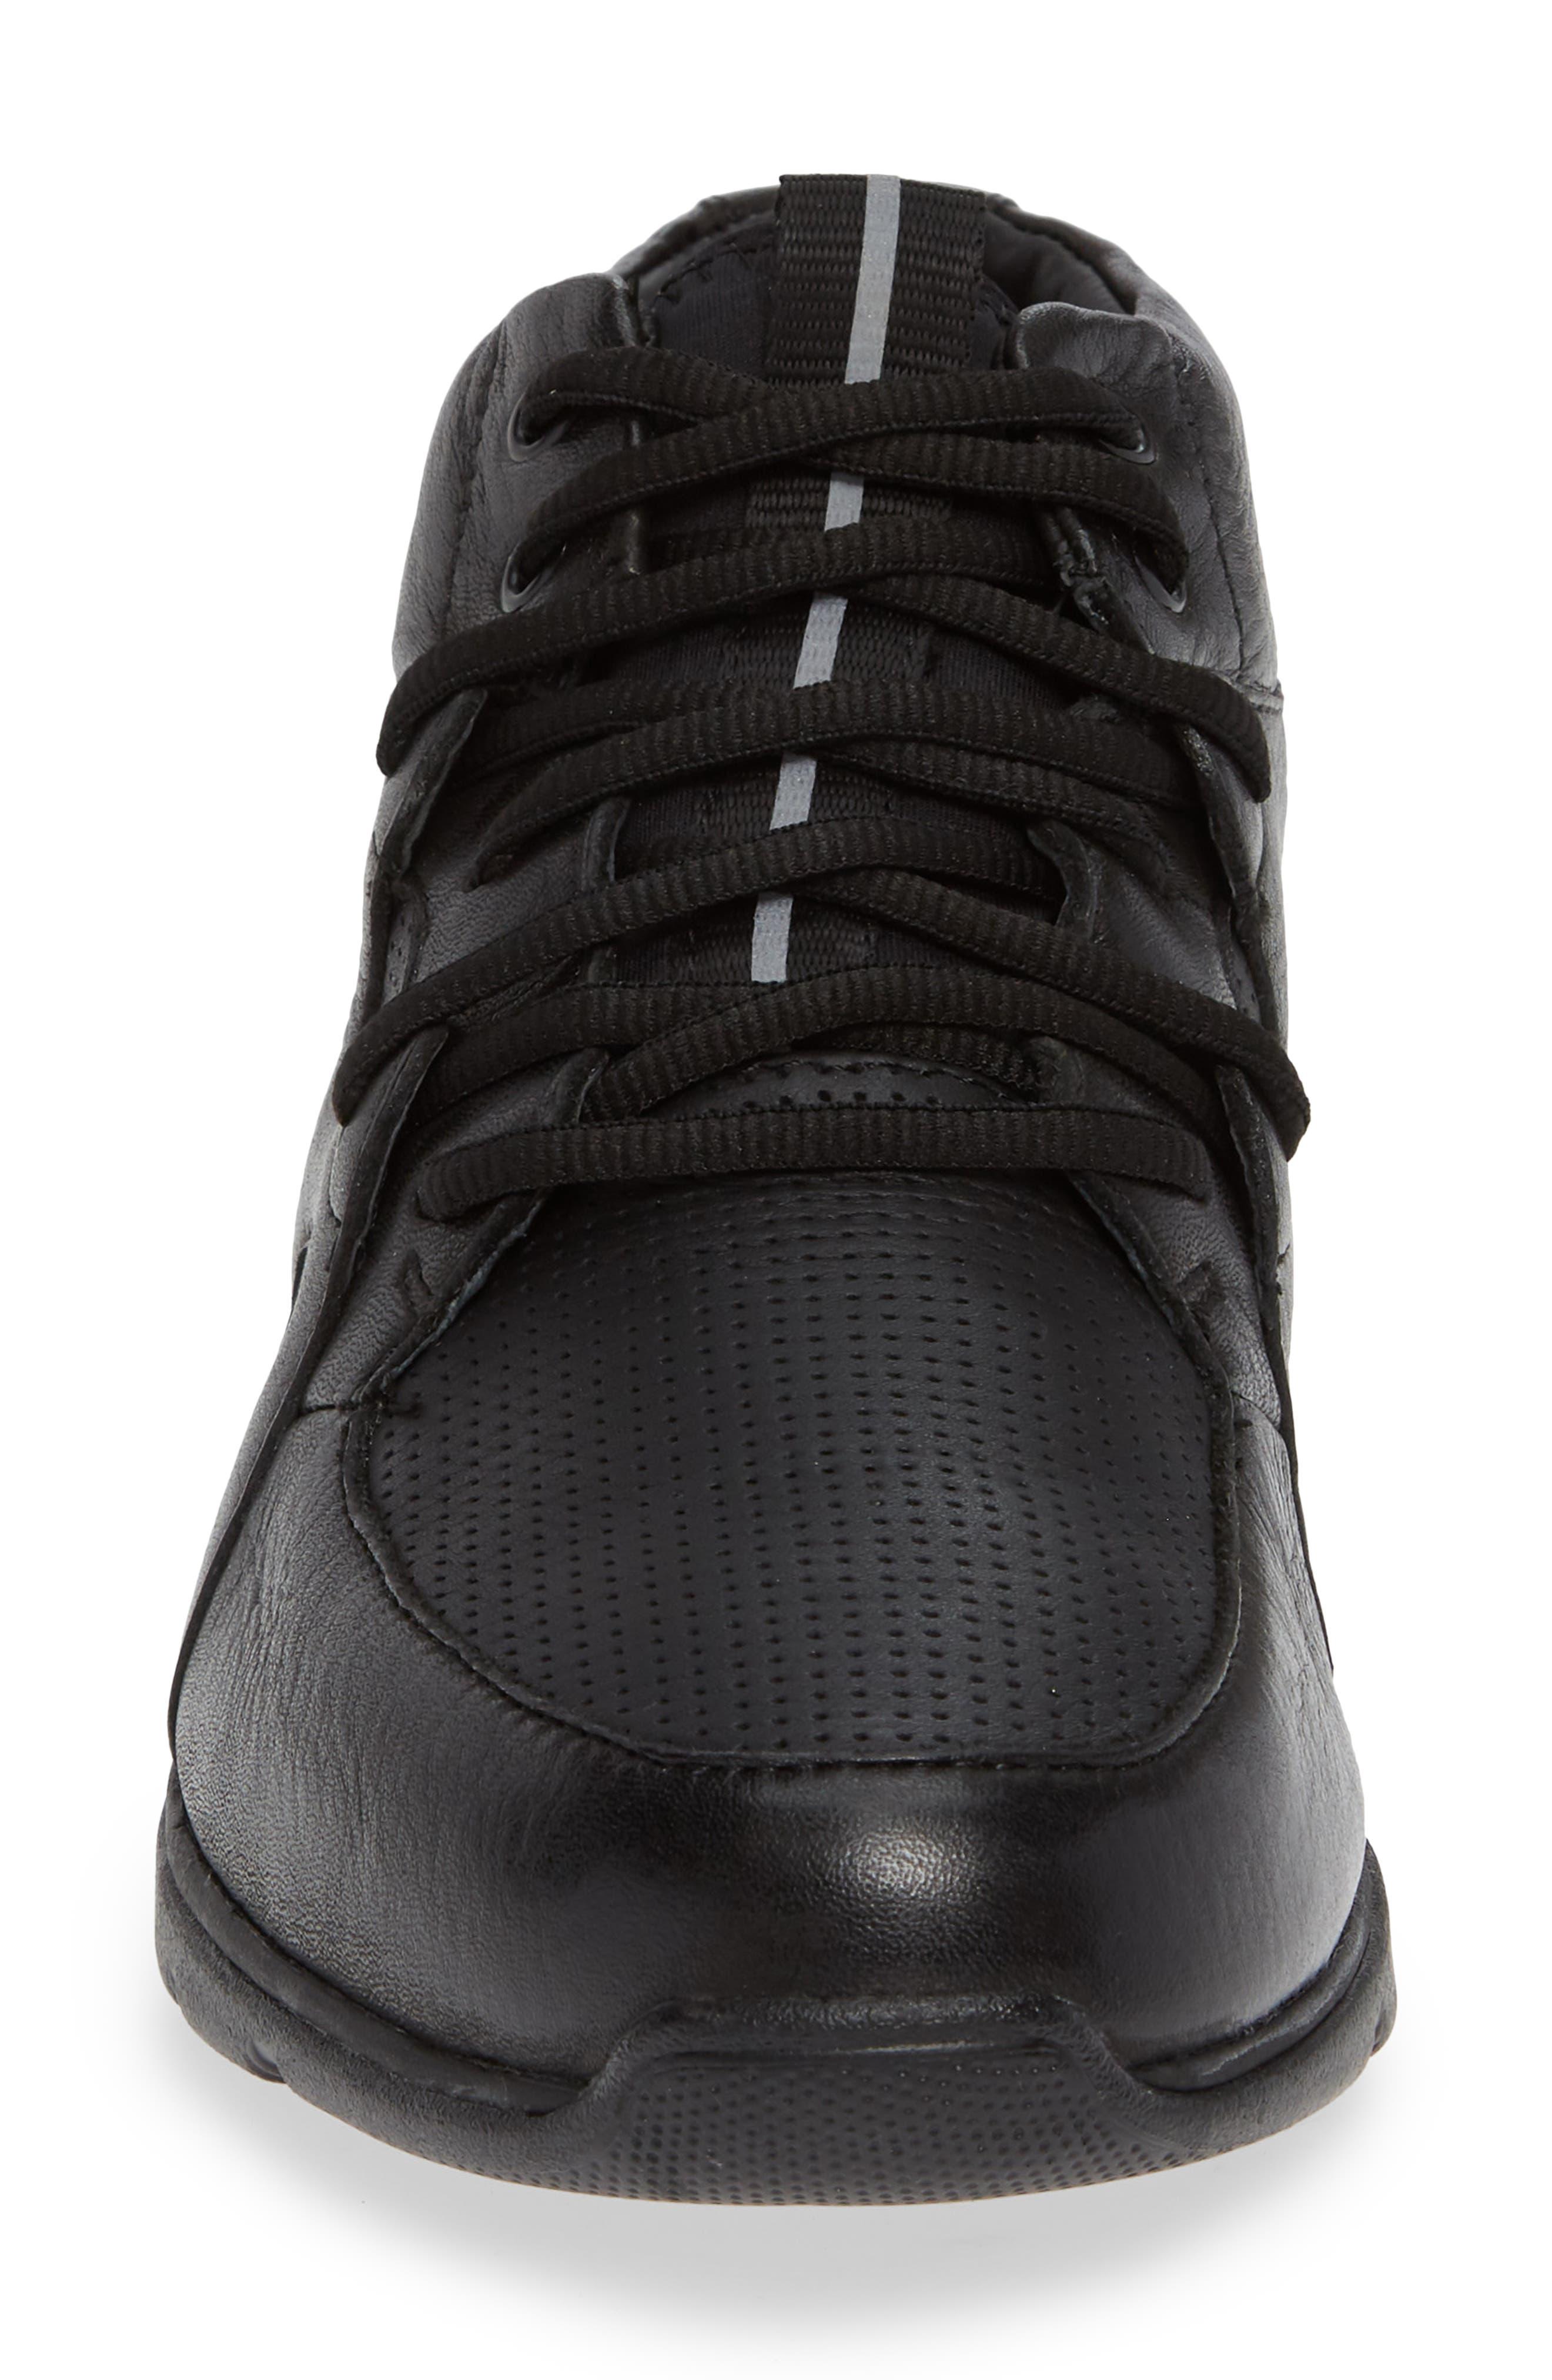 JOHNSTON & MURPHY, Prentiss Waterproof Sneaker, Alternate thumbnail 4, color, BLACK LEATHER